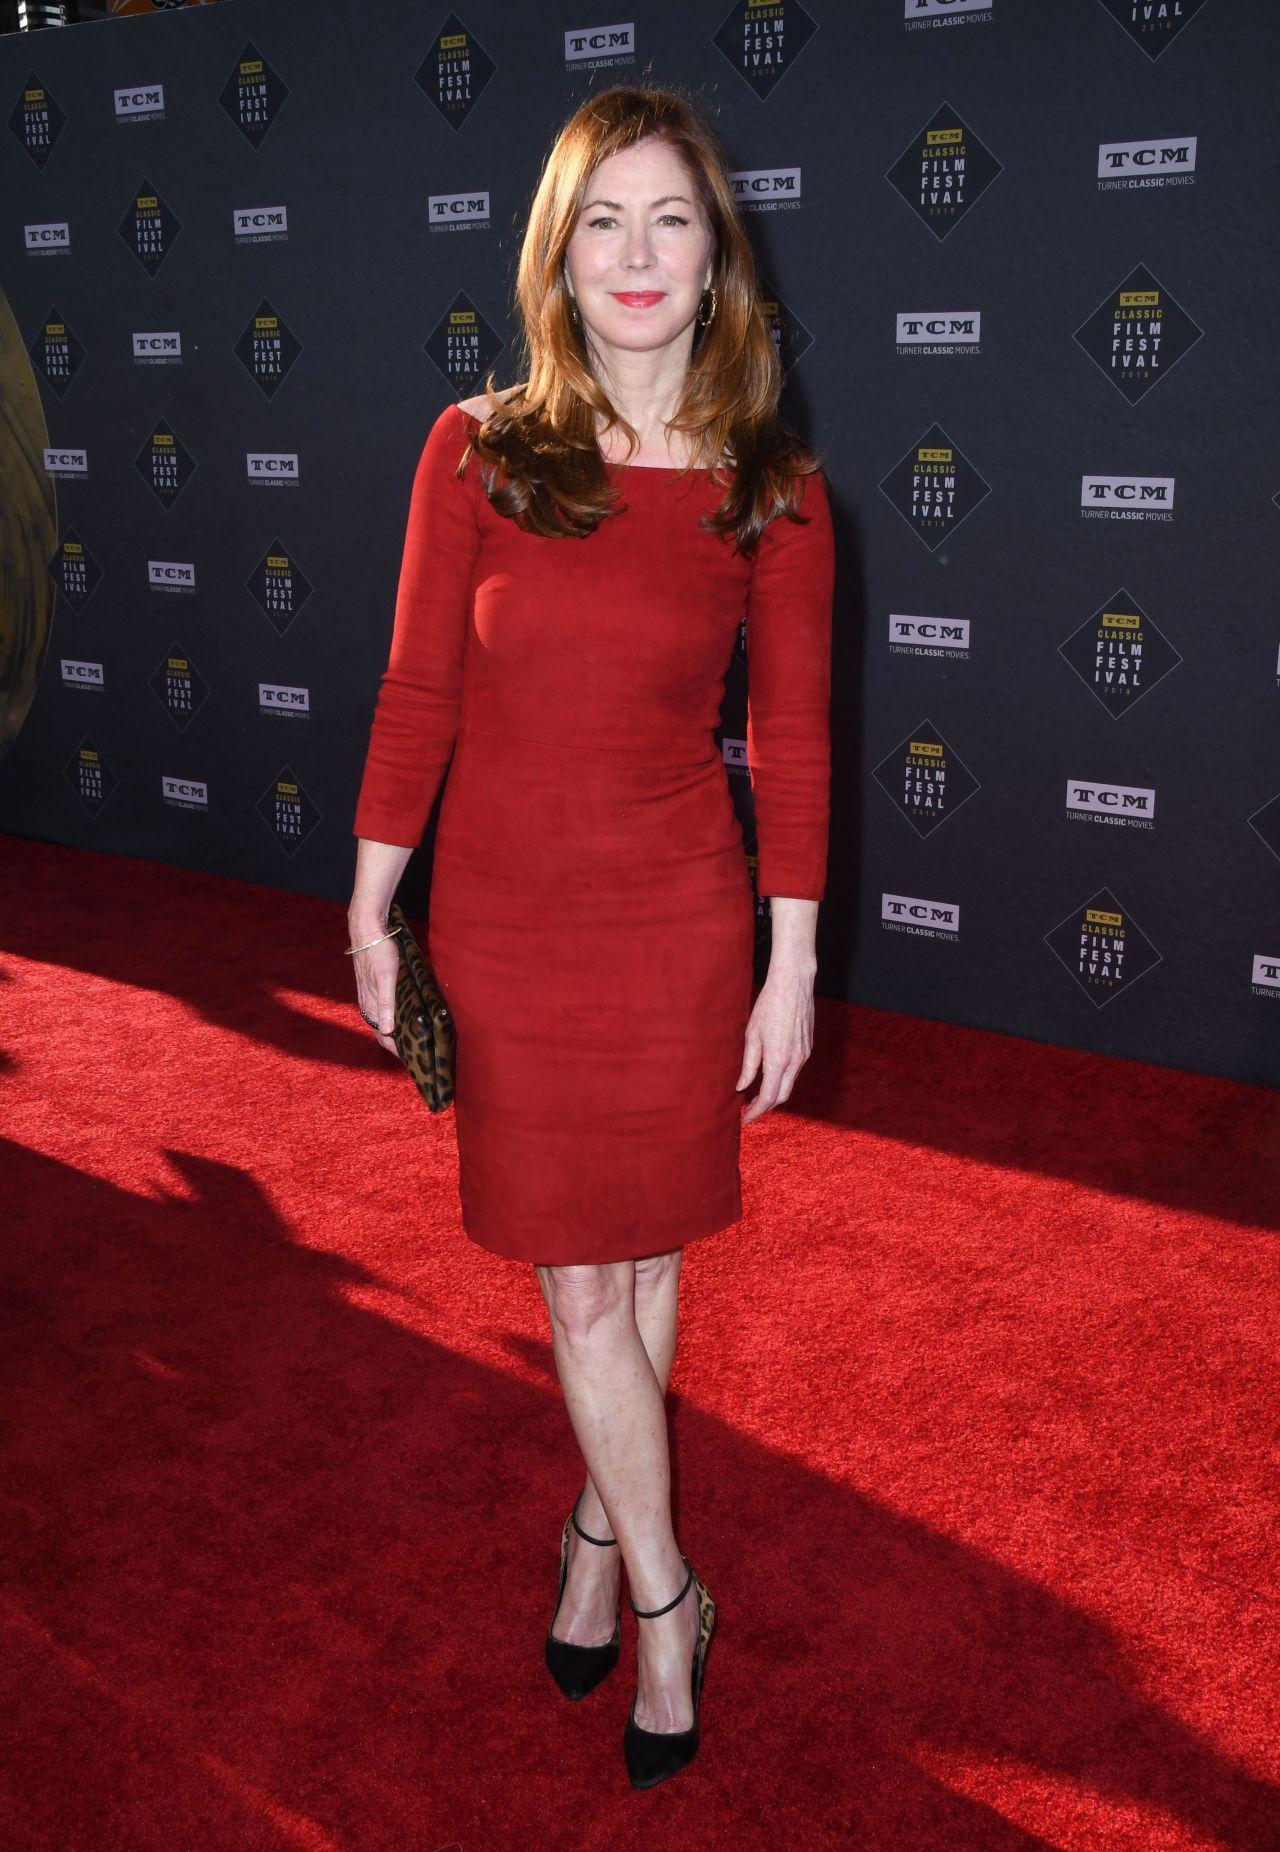 caitlin fitzgerald_Dana Delany - 2018 TCM Classic Film Festival Opening Night in LA • CelebMafia